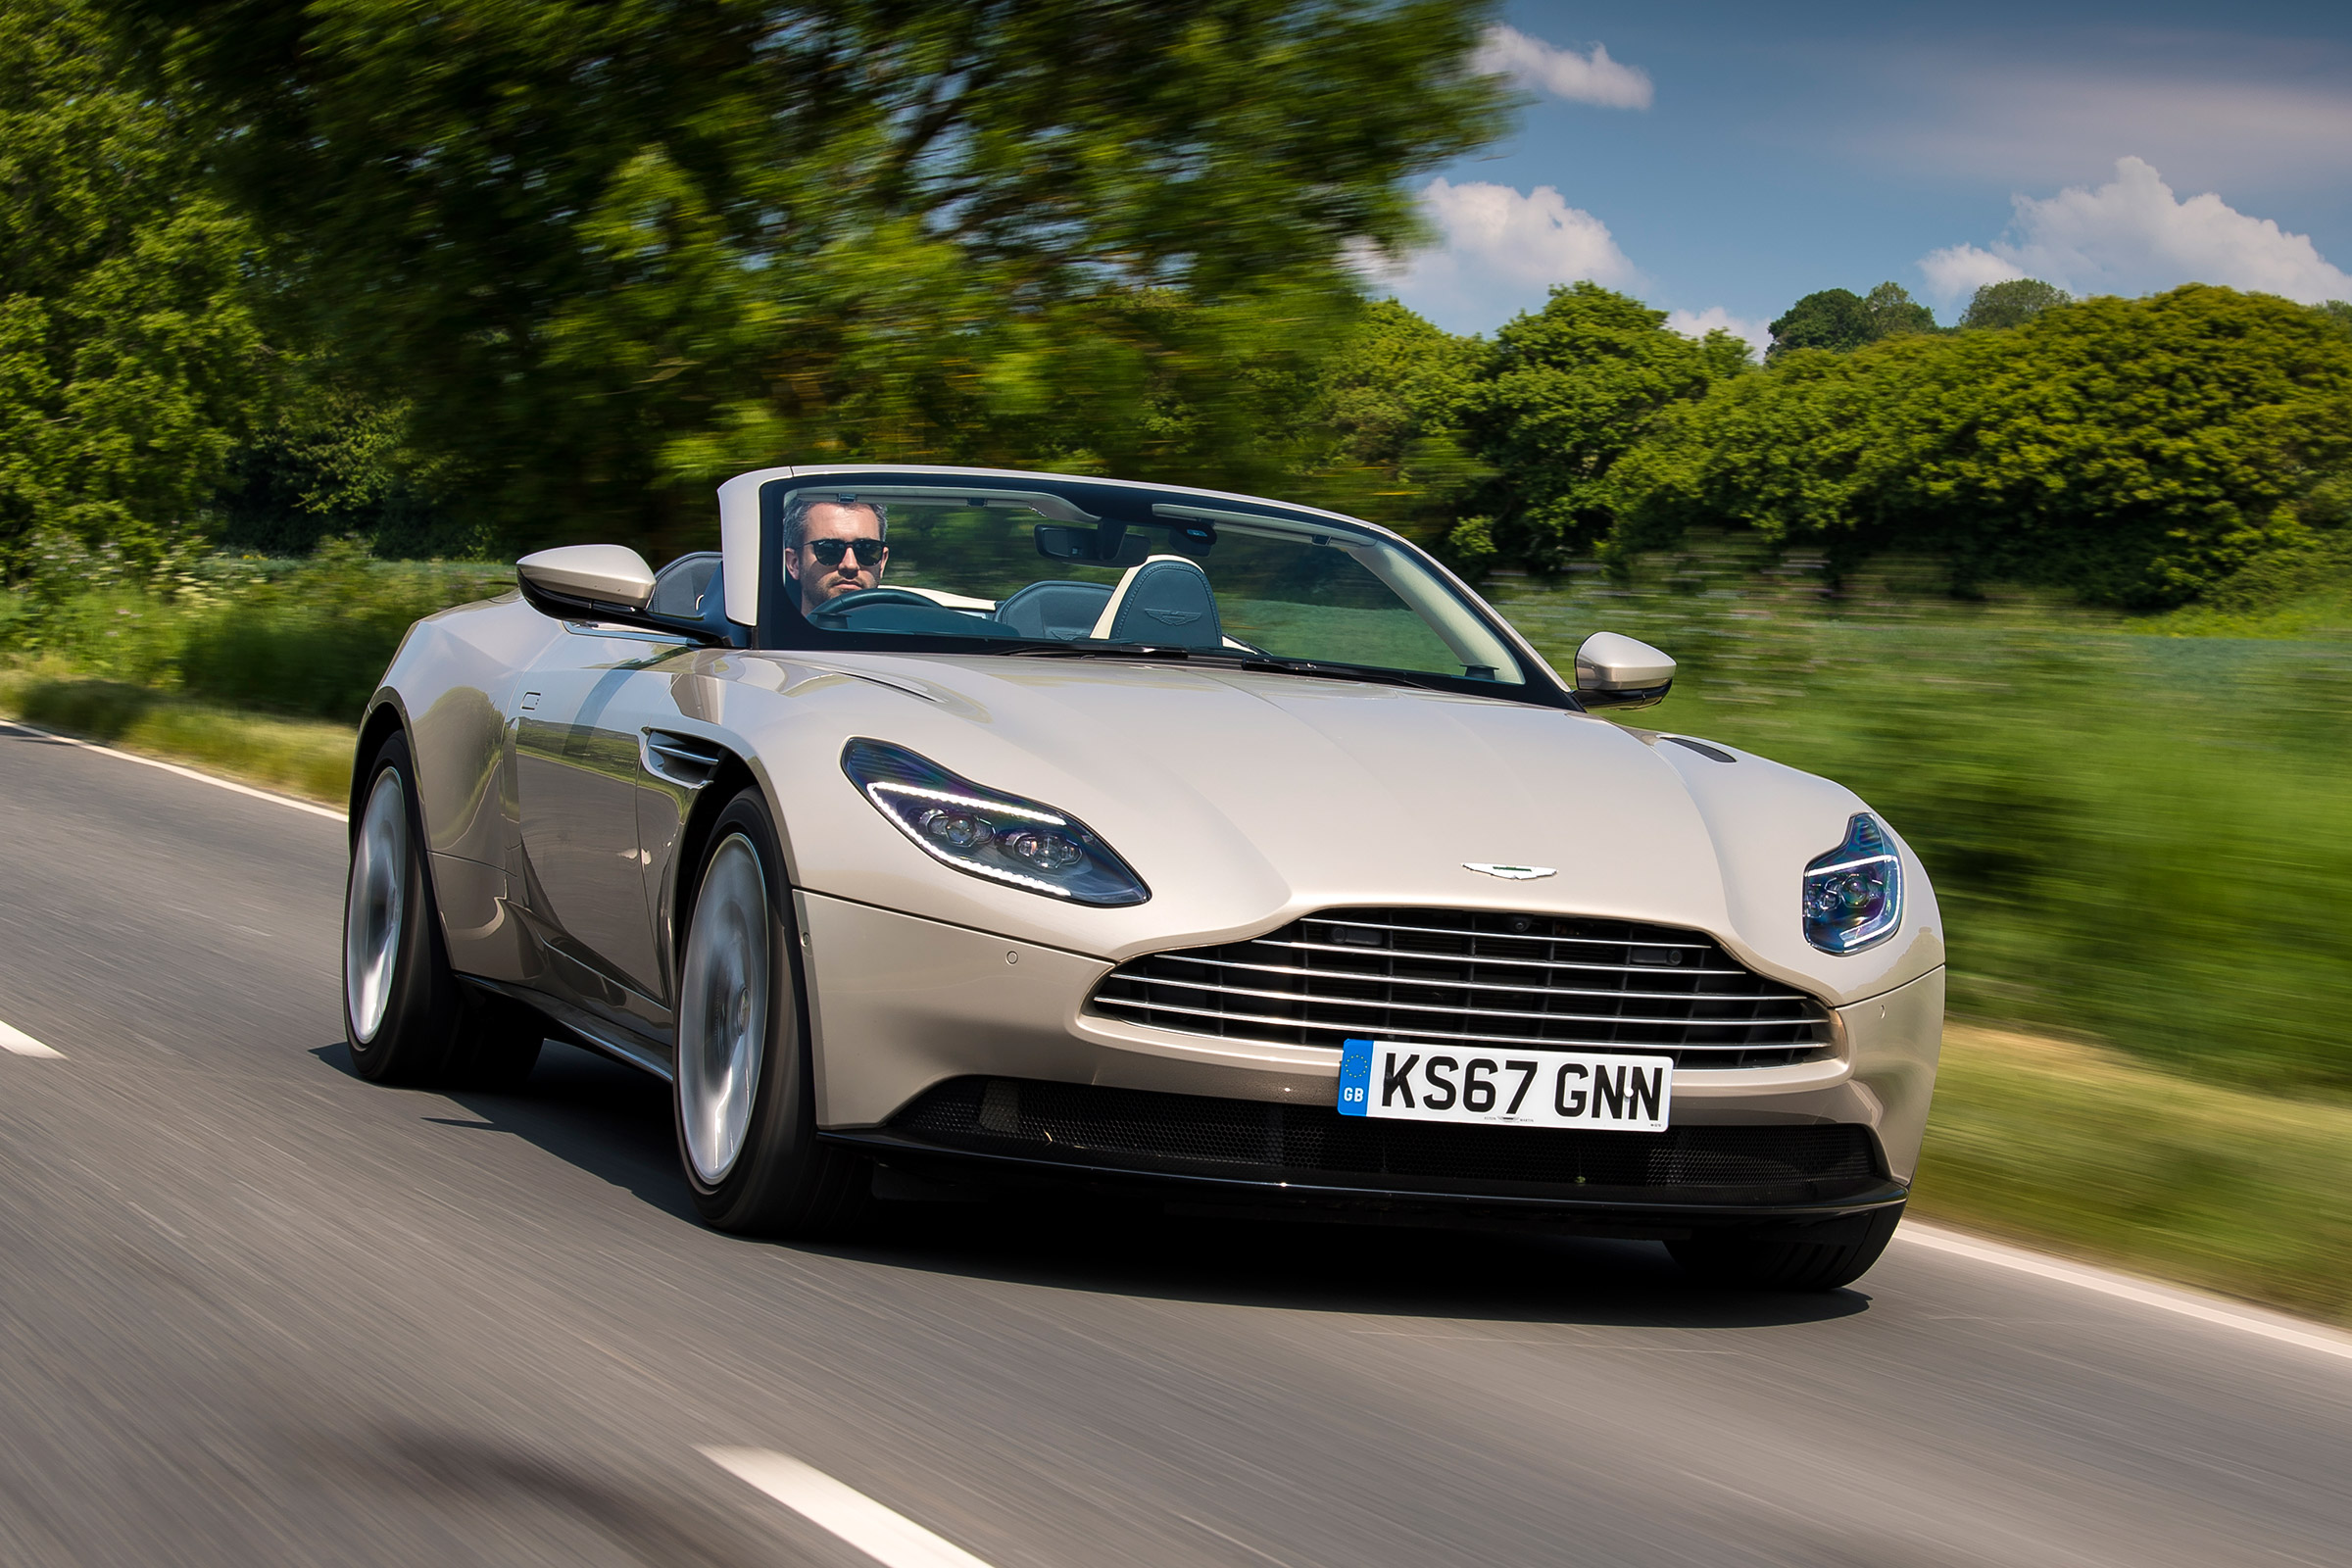 New Aston Martin Db11 Volante 2018 Review Auto Express